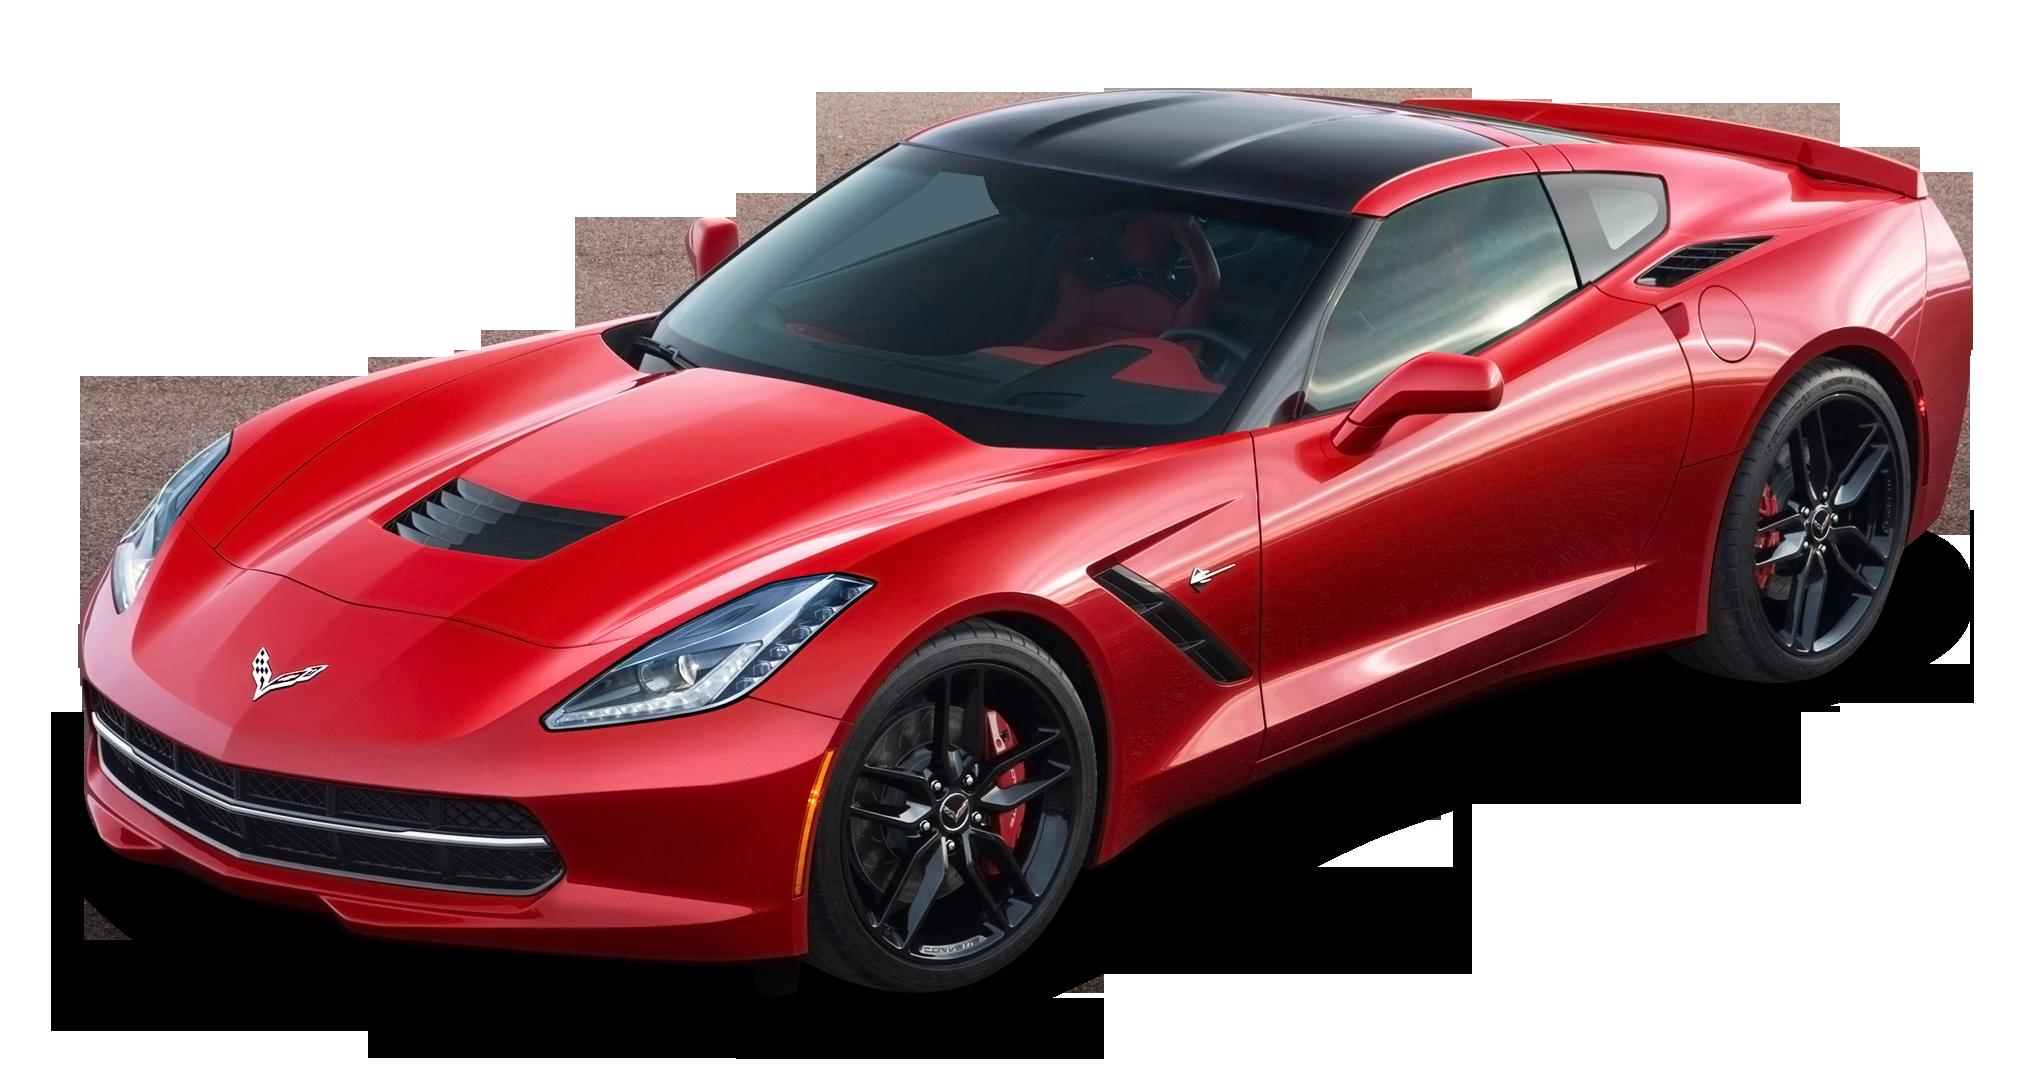 Red Chevrolet Corvette Stingray Top View Car Png Image Corvette Stingray Chevrolet Corvette Stingray Chevrolet Corvette